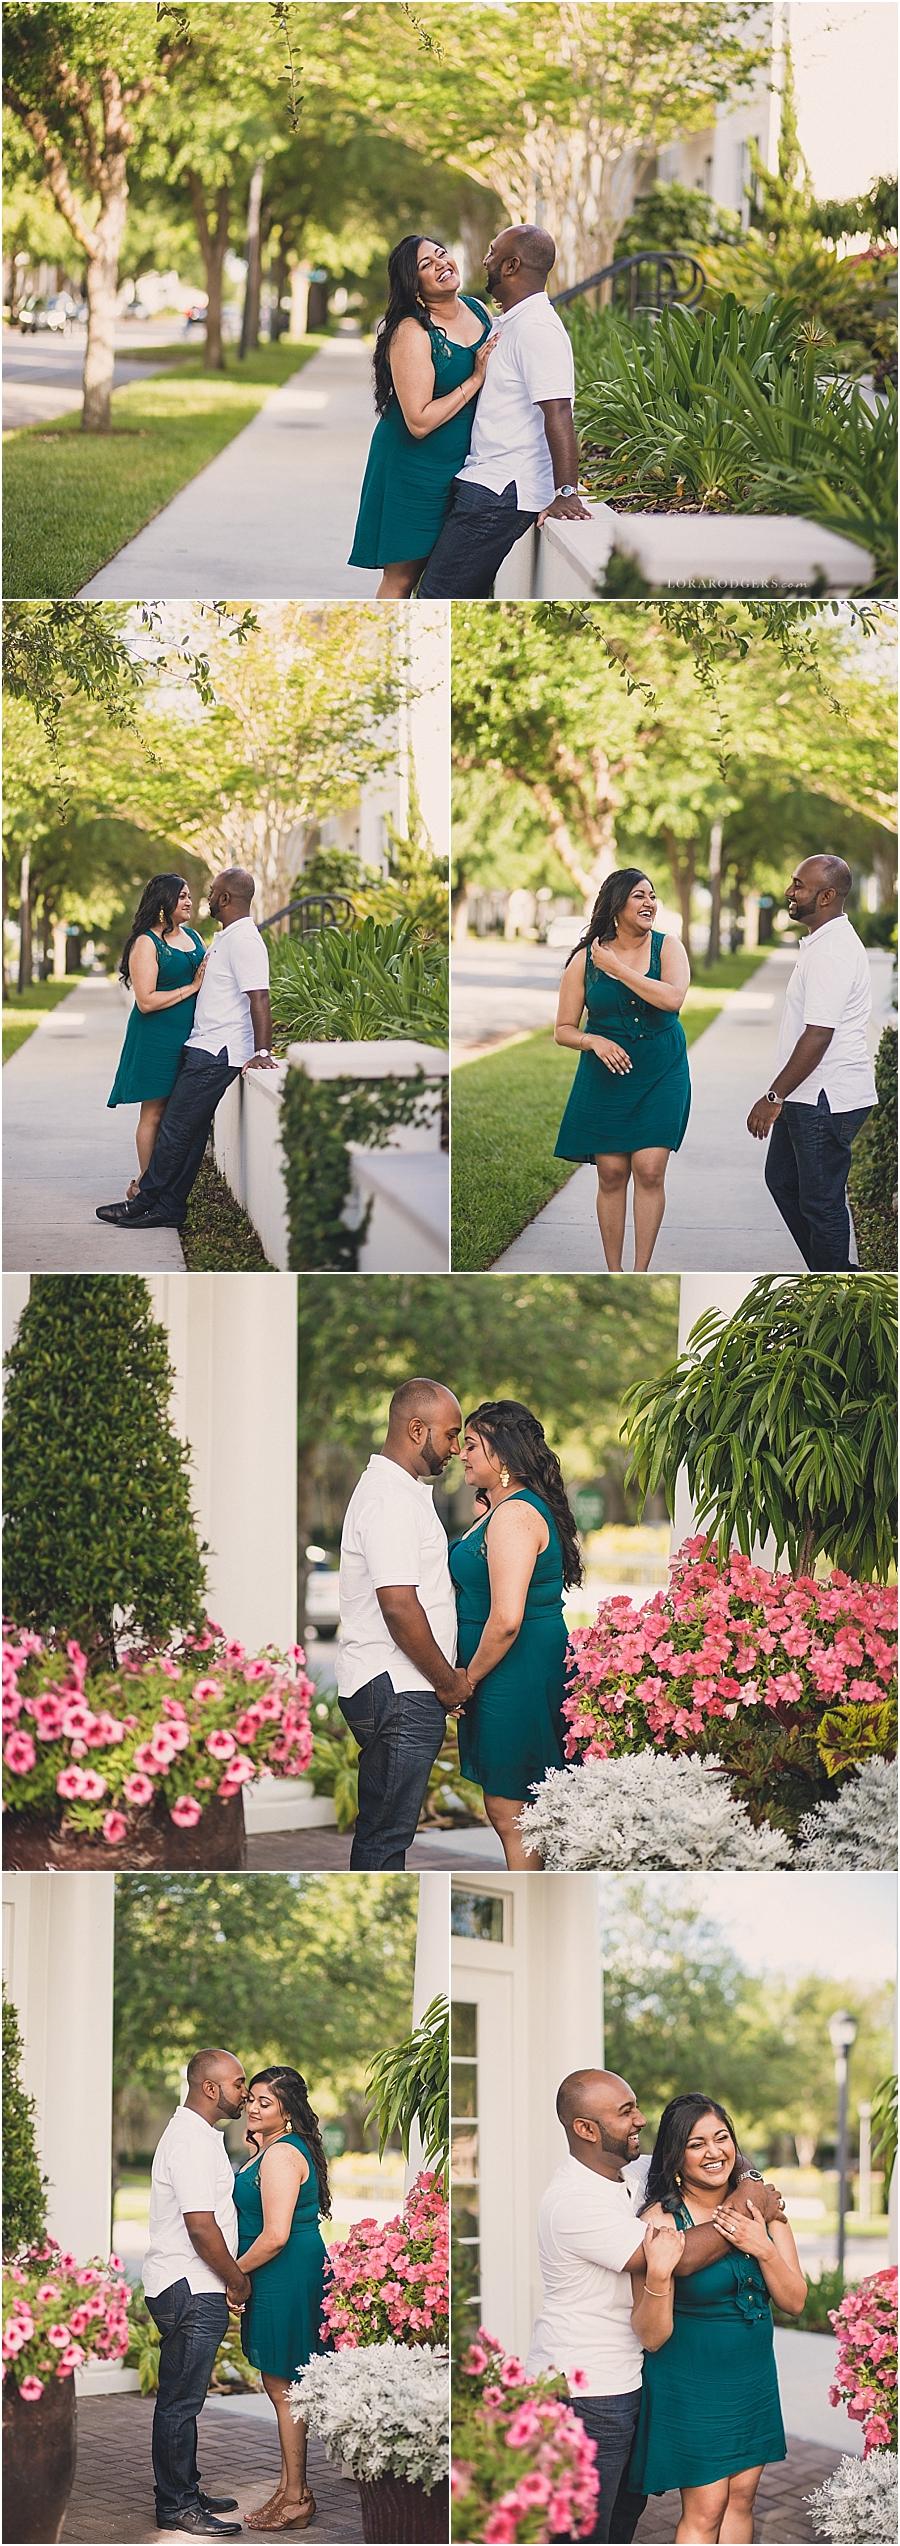 Baldwin_Park_Orlando_Florida_Engagement_001